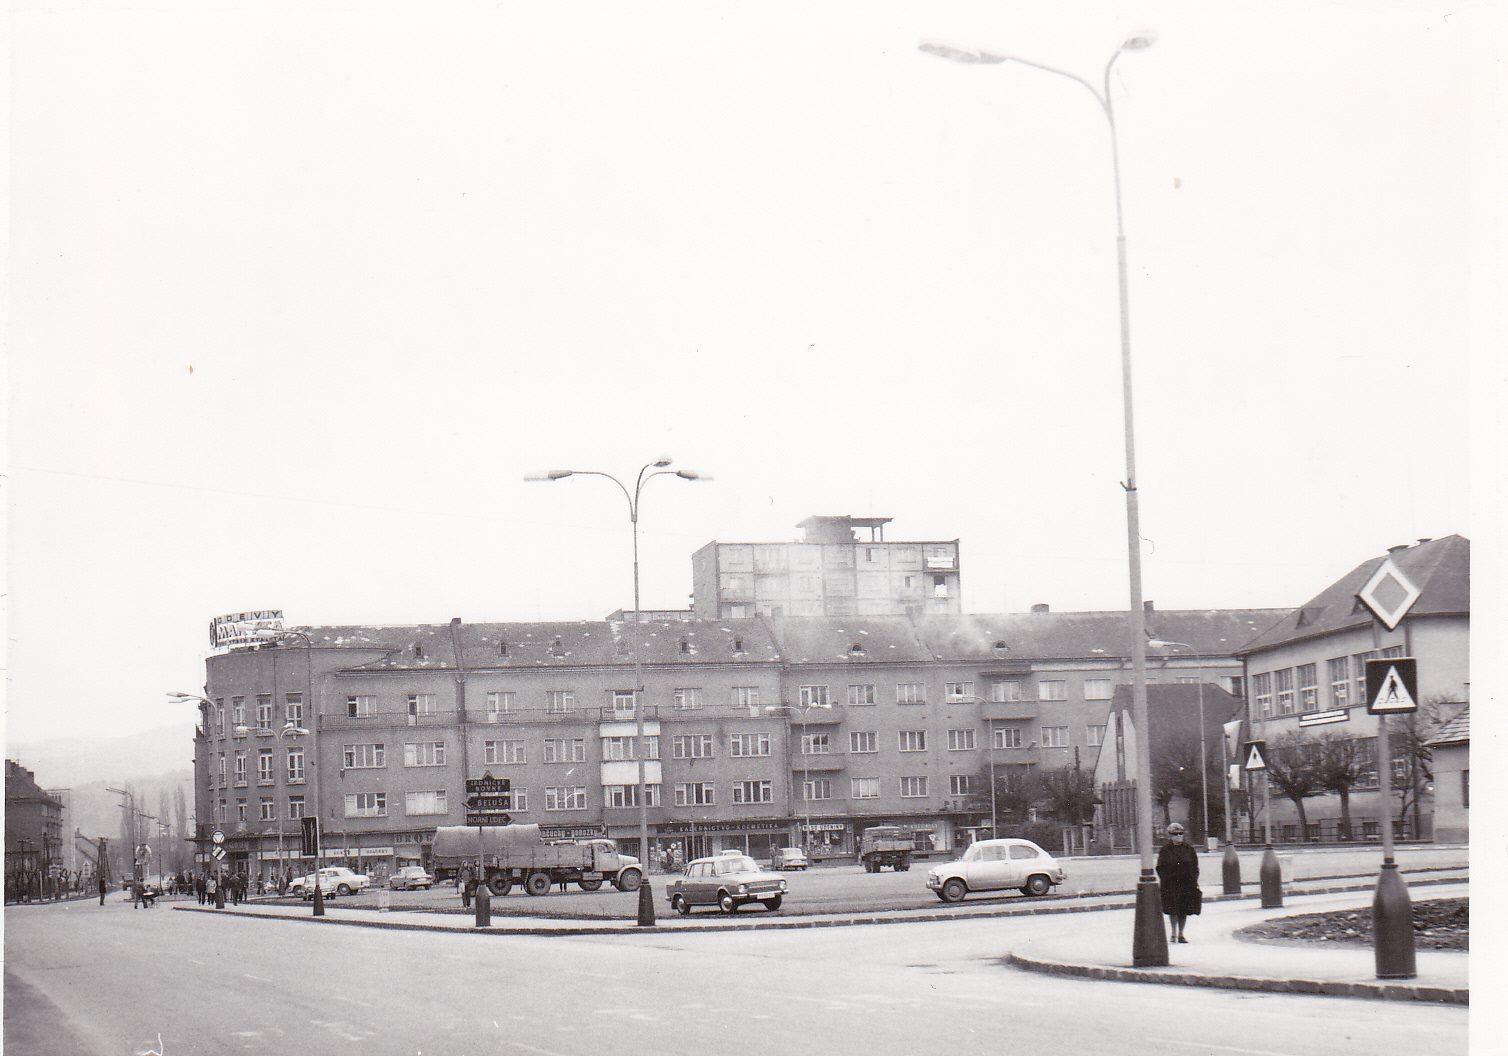 Parkovisko medzi Hollého a Poštovou ulicou v roku 1976